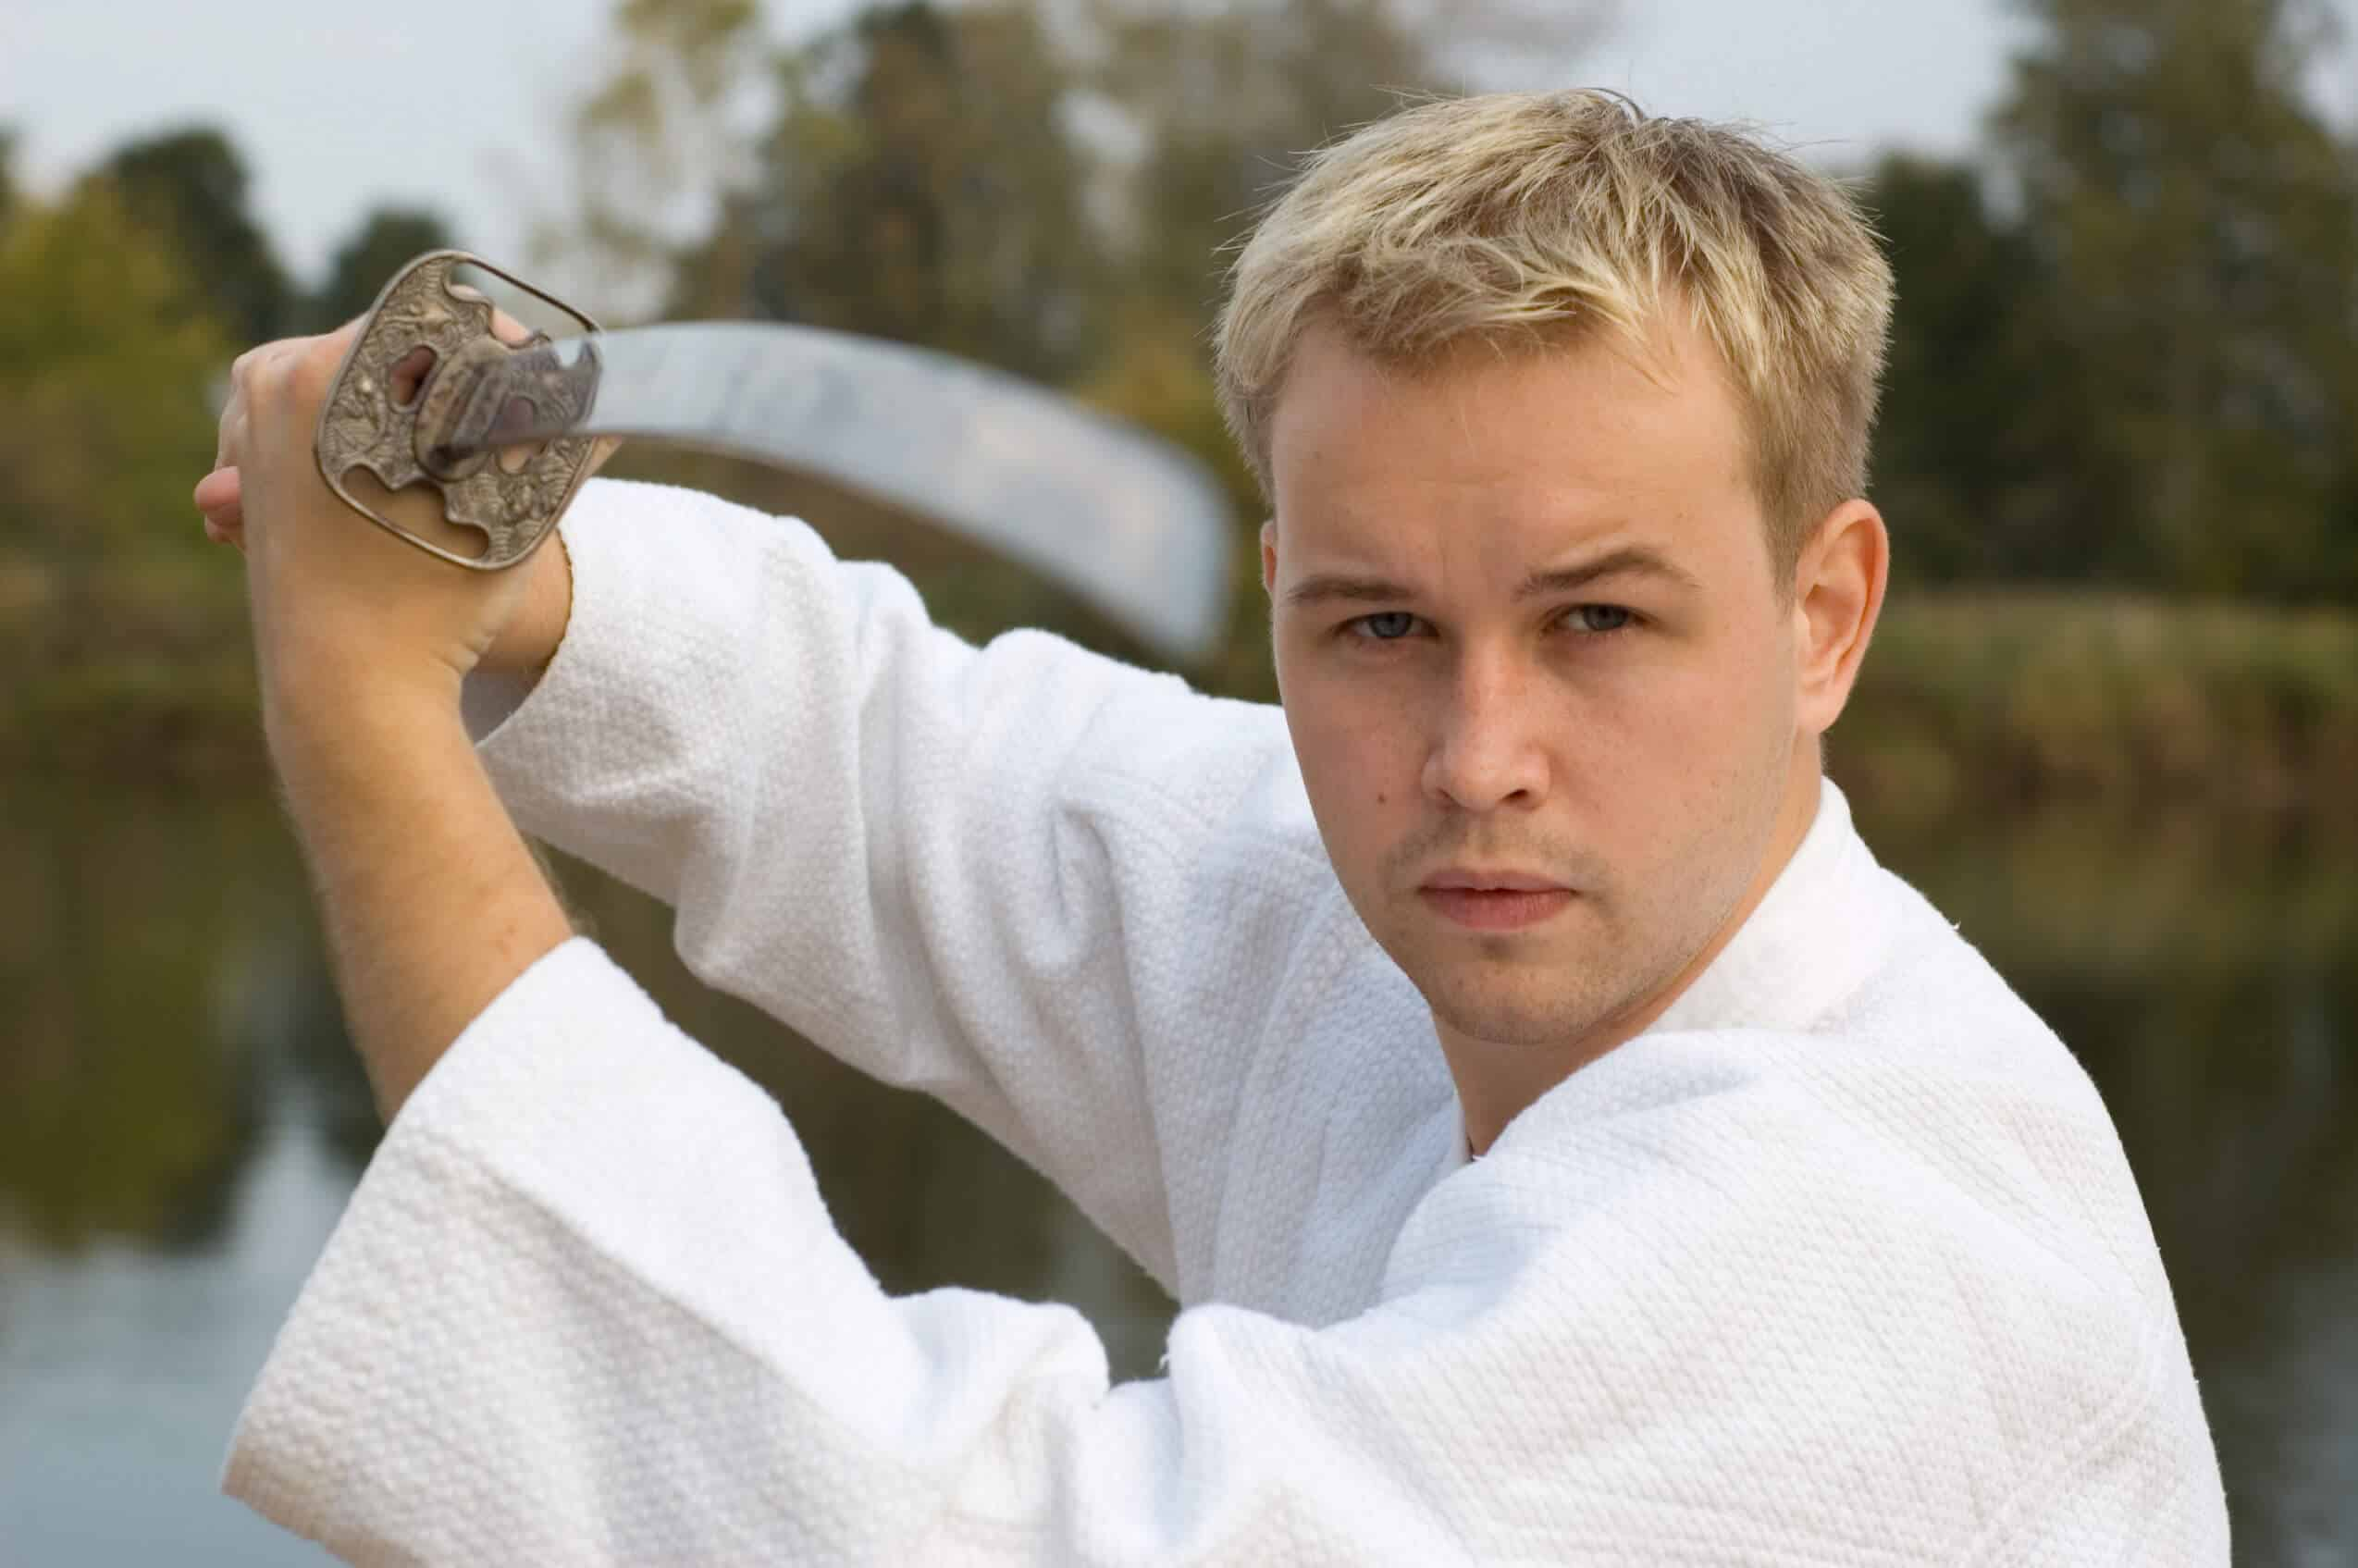 Martial Arts Lessons for Adults in _Williamsburg_ _VA_ - Samurai Sword Posing Blog